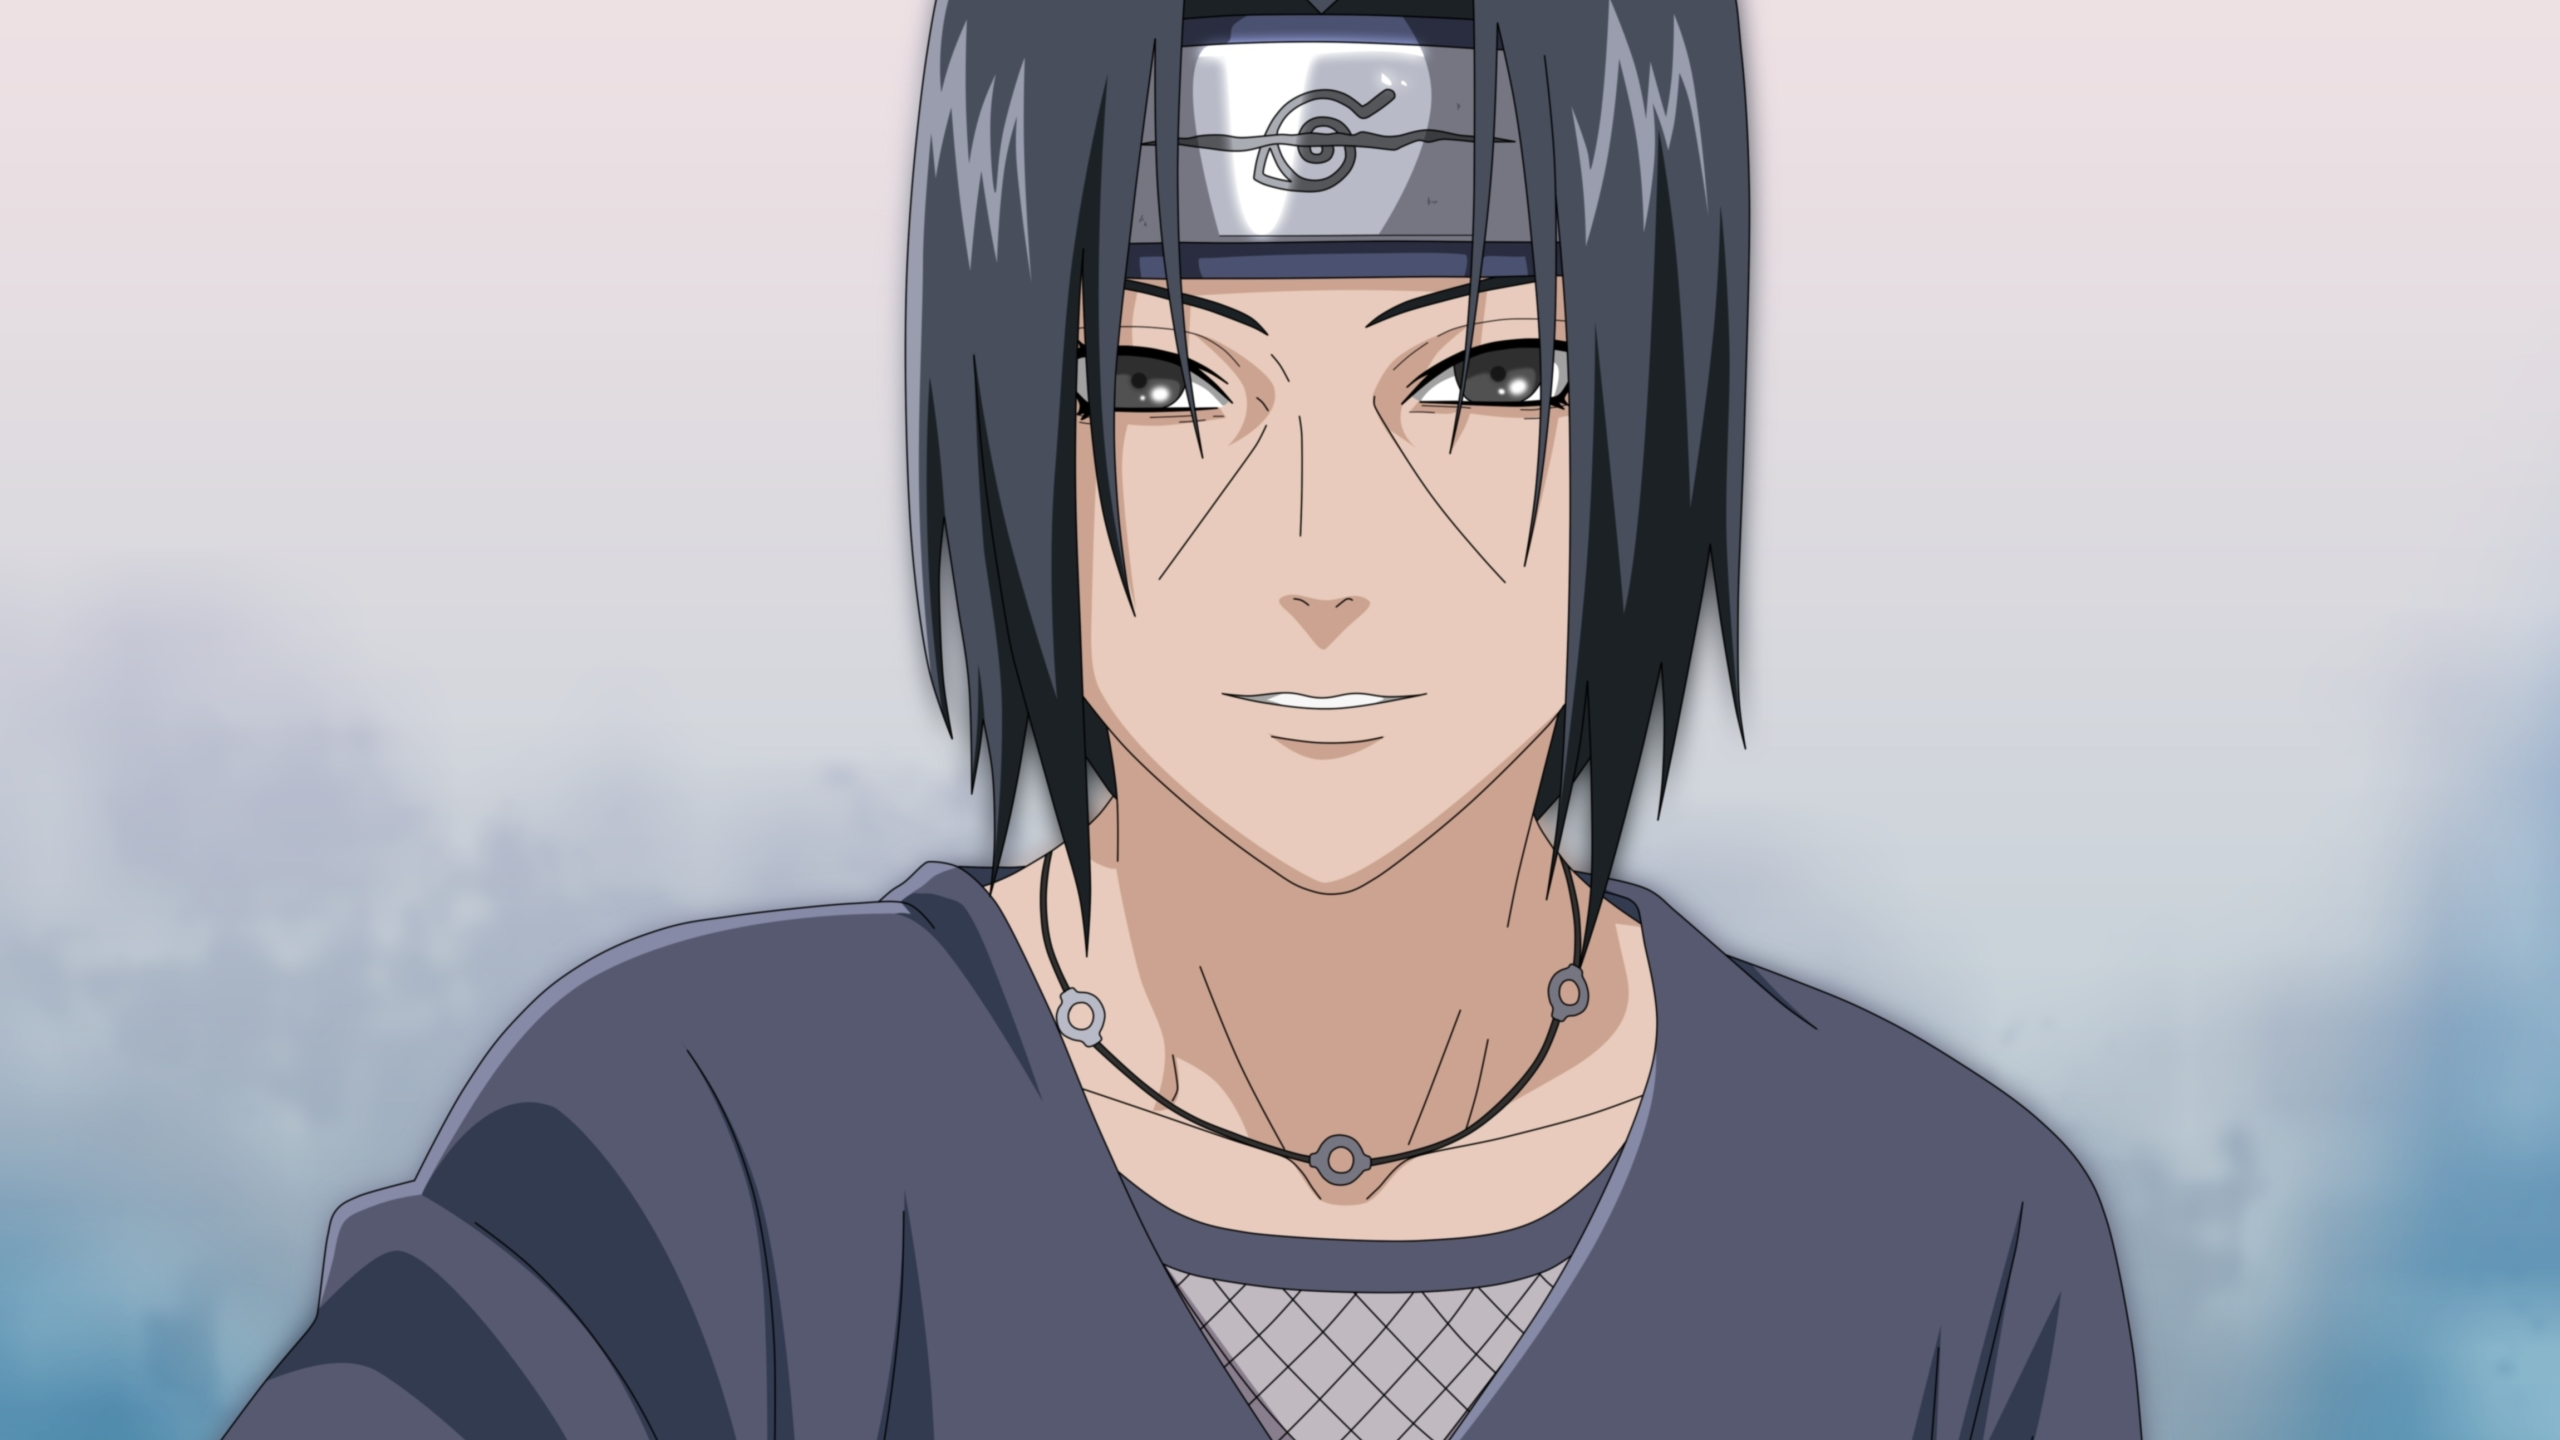 2560x1440 Naruto Itachi Uchiha Nukenin 1440p Resolution Wallpaper Hd Anime 4k Wallpapers Images Photos And Background